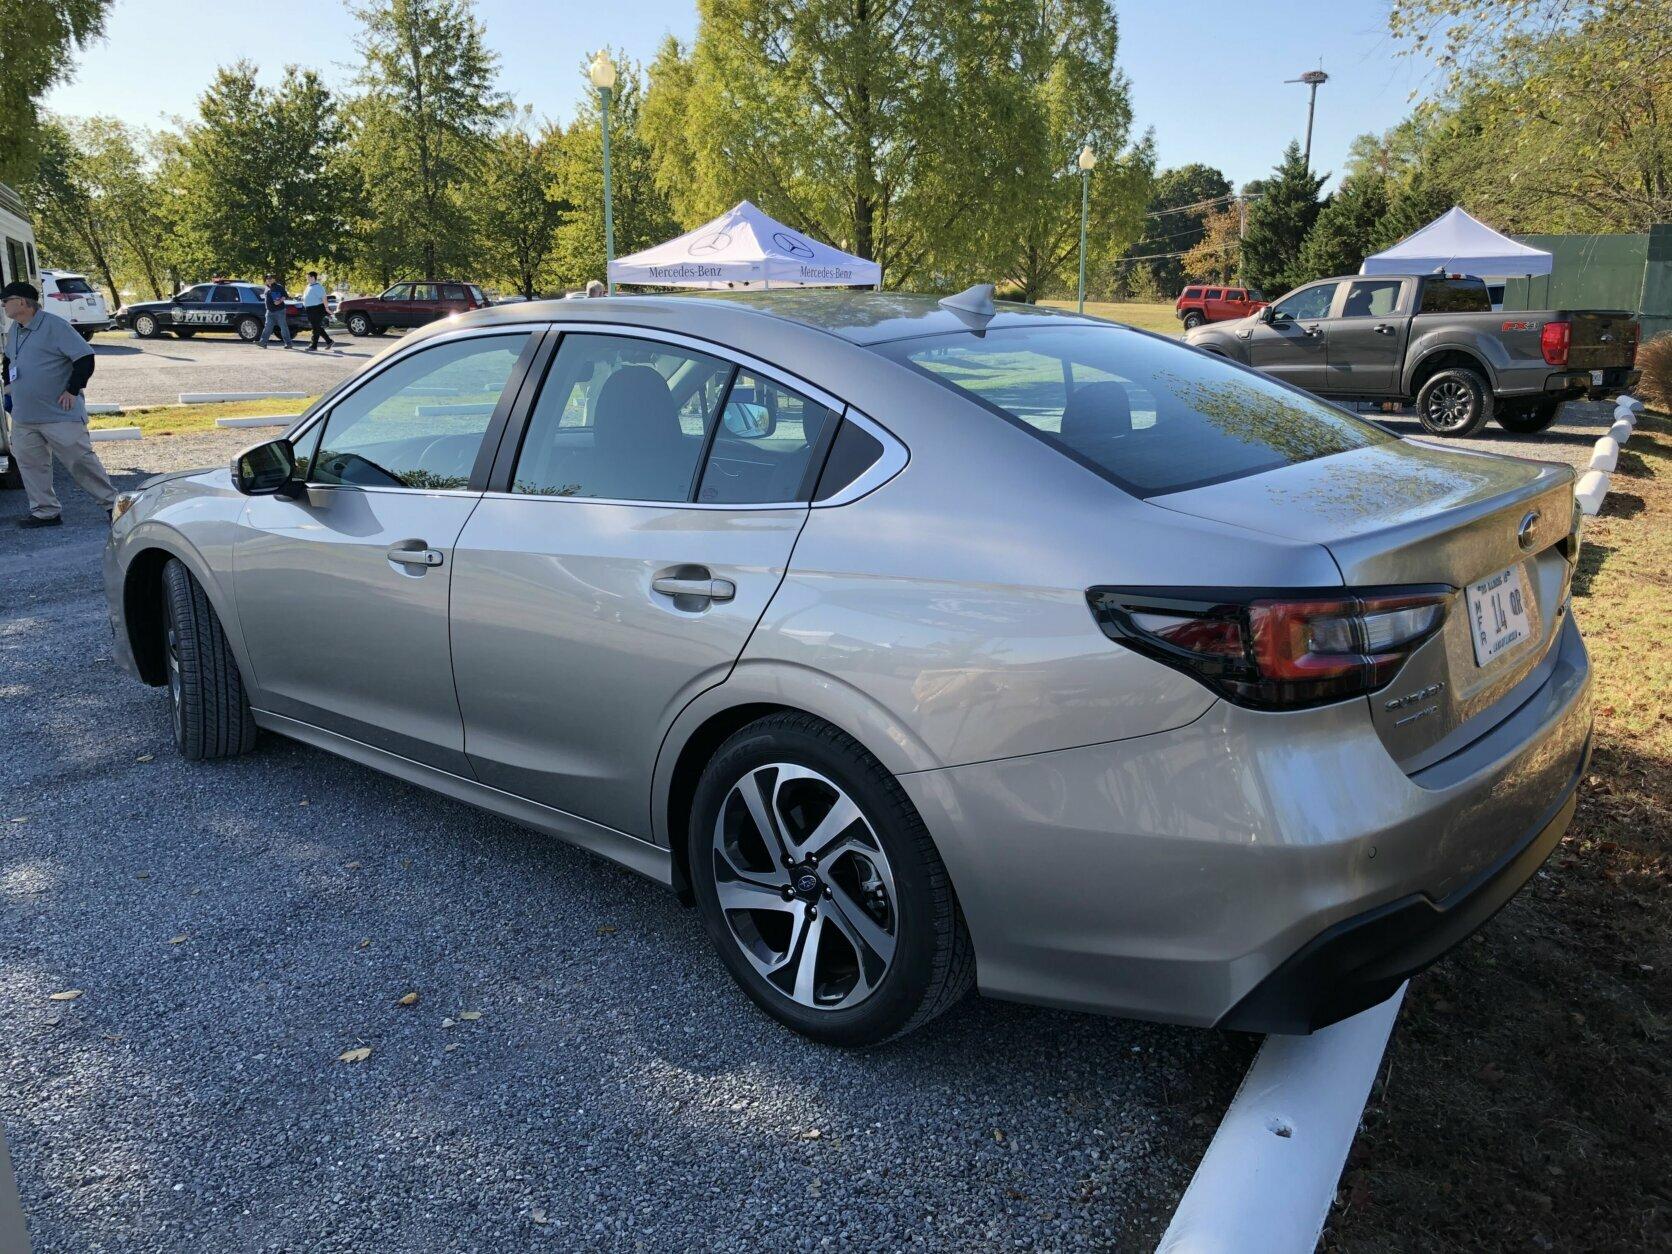 2020 Subaru Legacy rear view